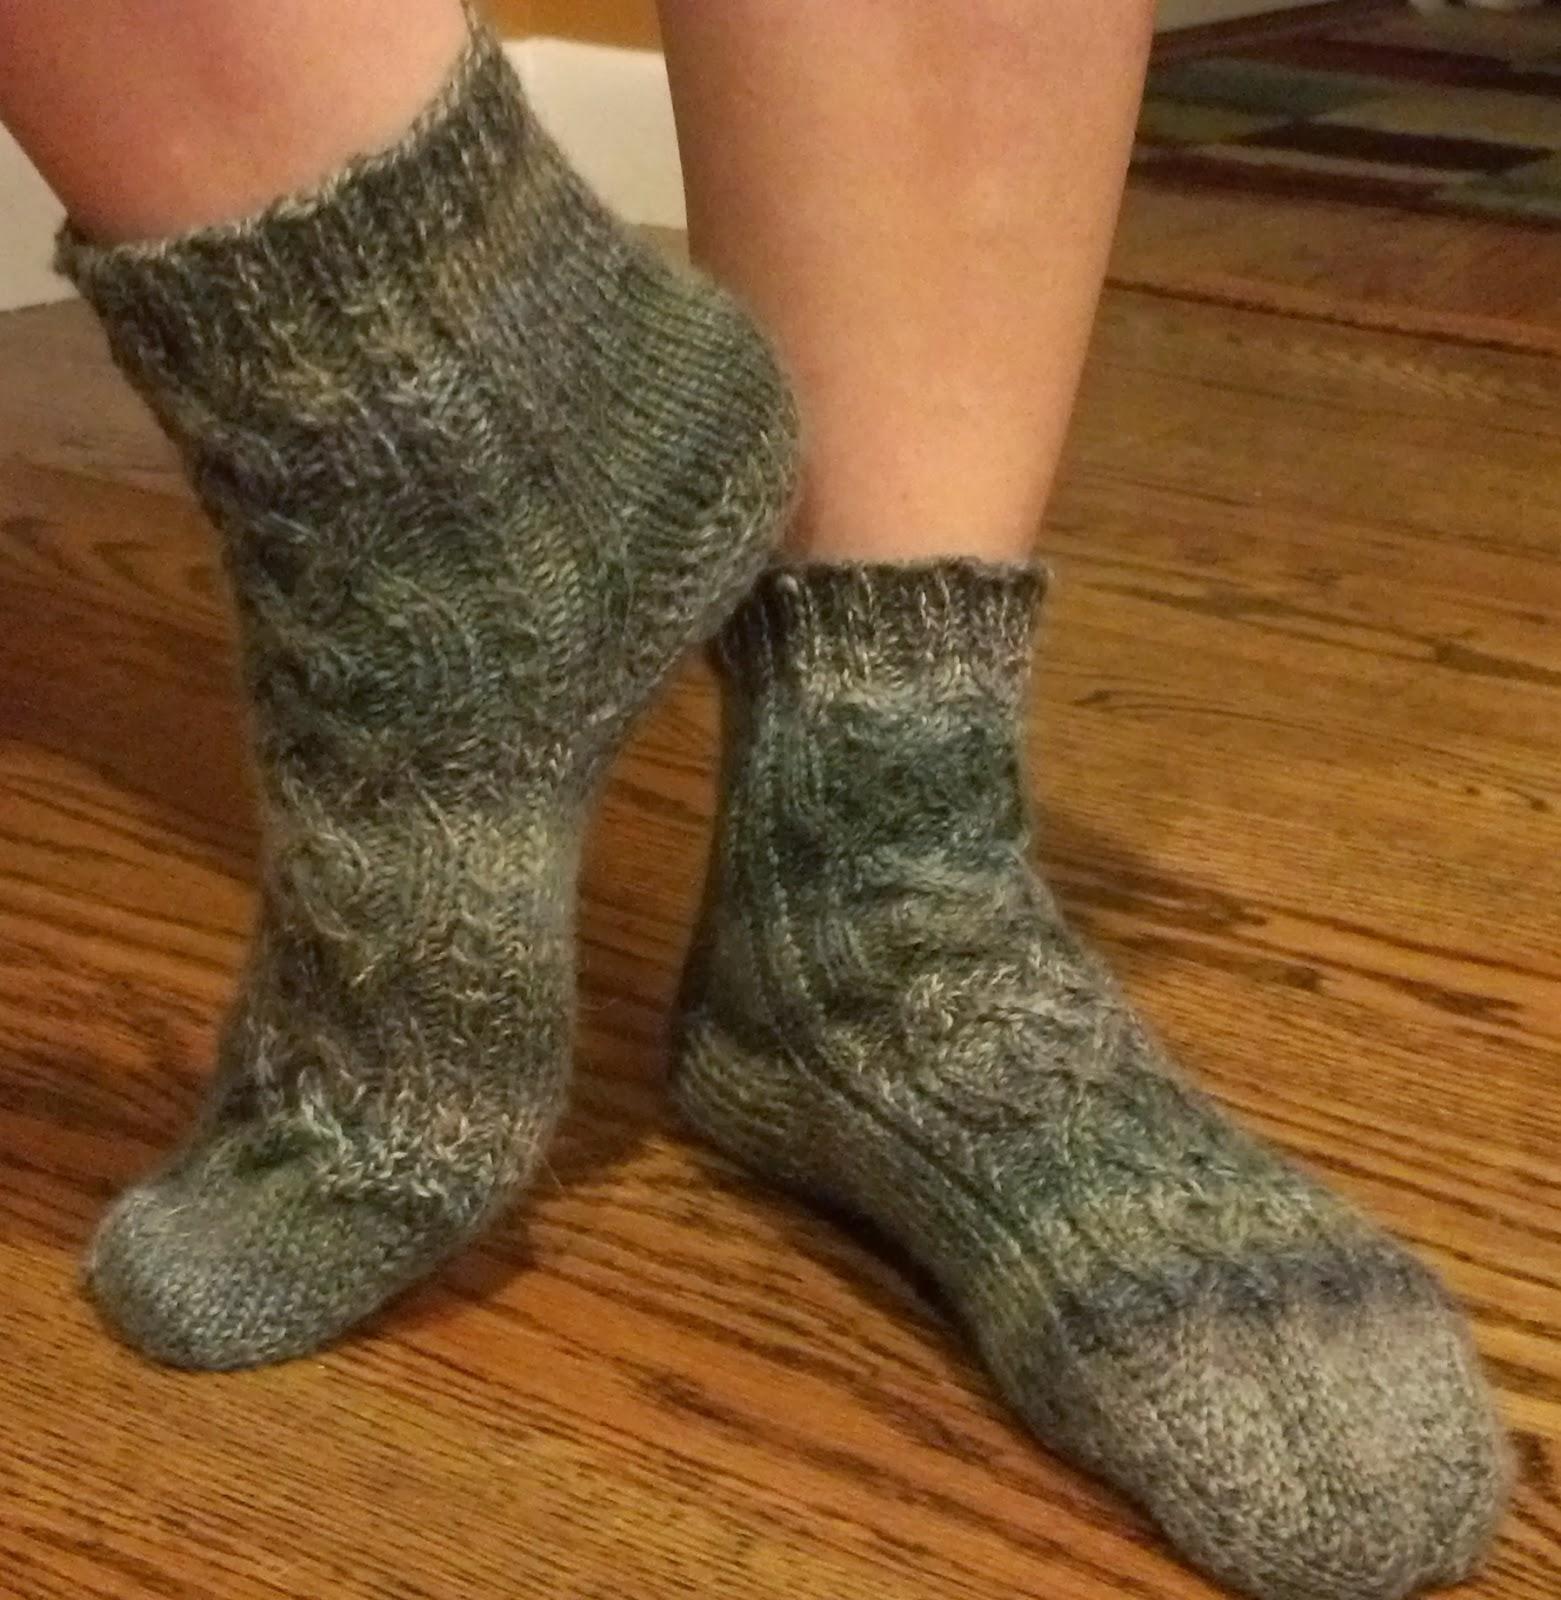 Crochet Socks Patterns Toe Up : Pattern: Celtic Cable Toe Up Socks Knit A Bit Crochet Away